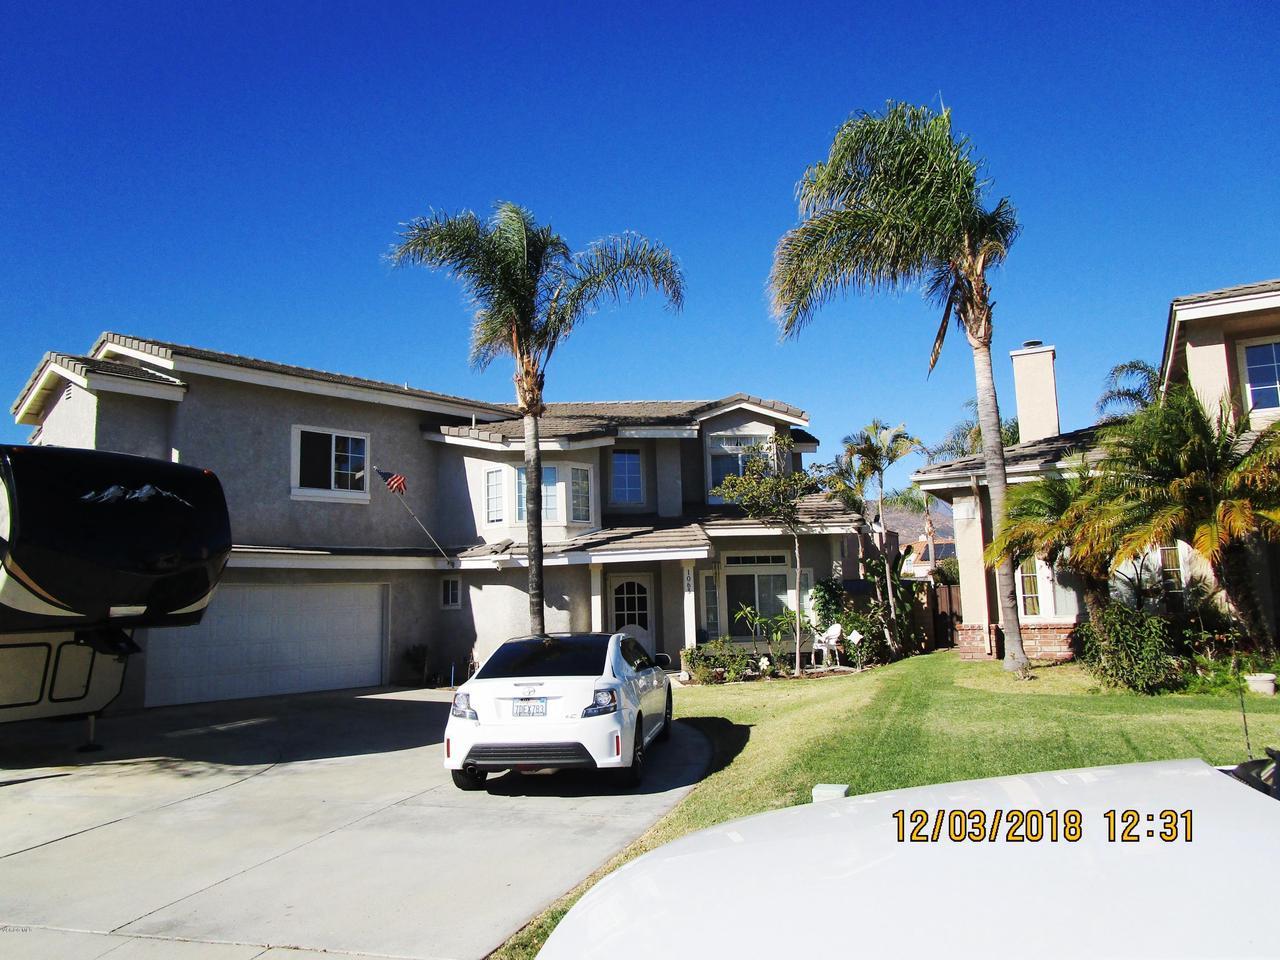 1063 MEADOWLARK, Fillmore, CA 93015 - front 2